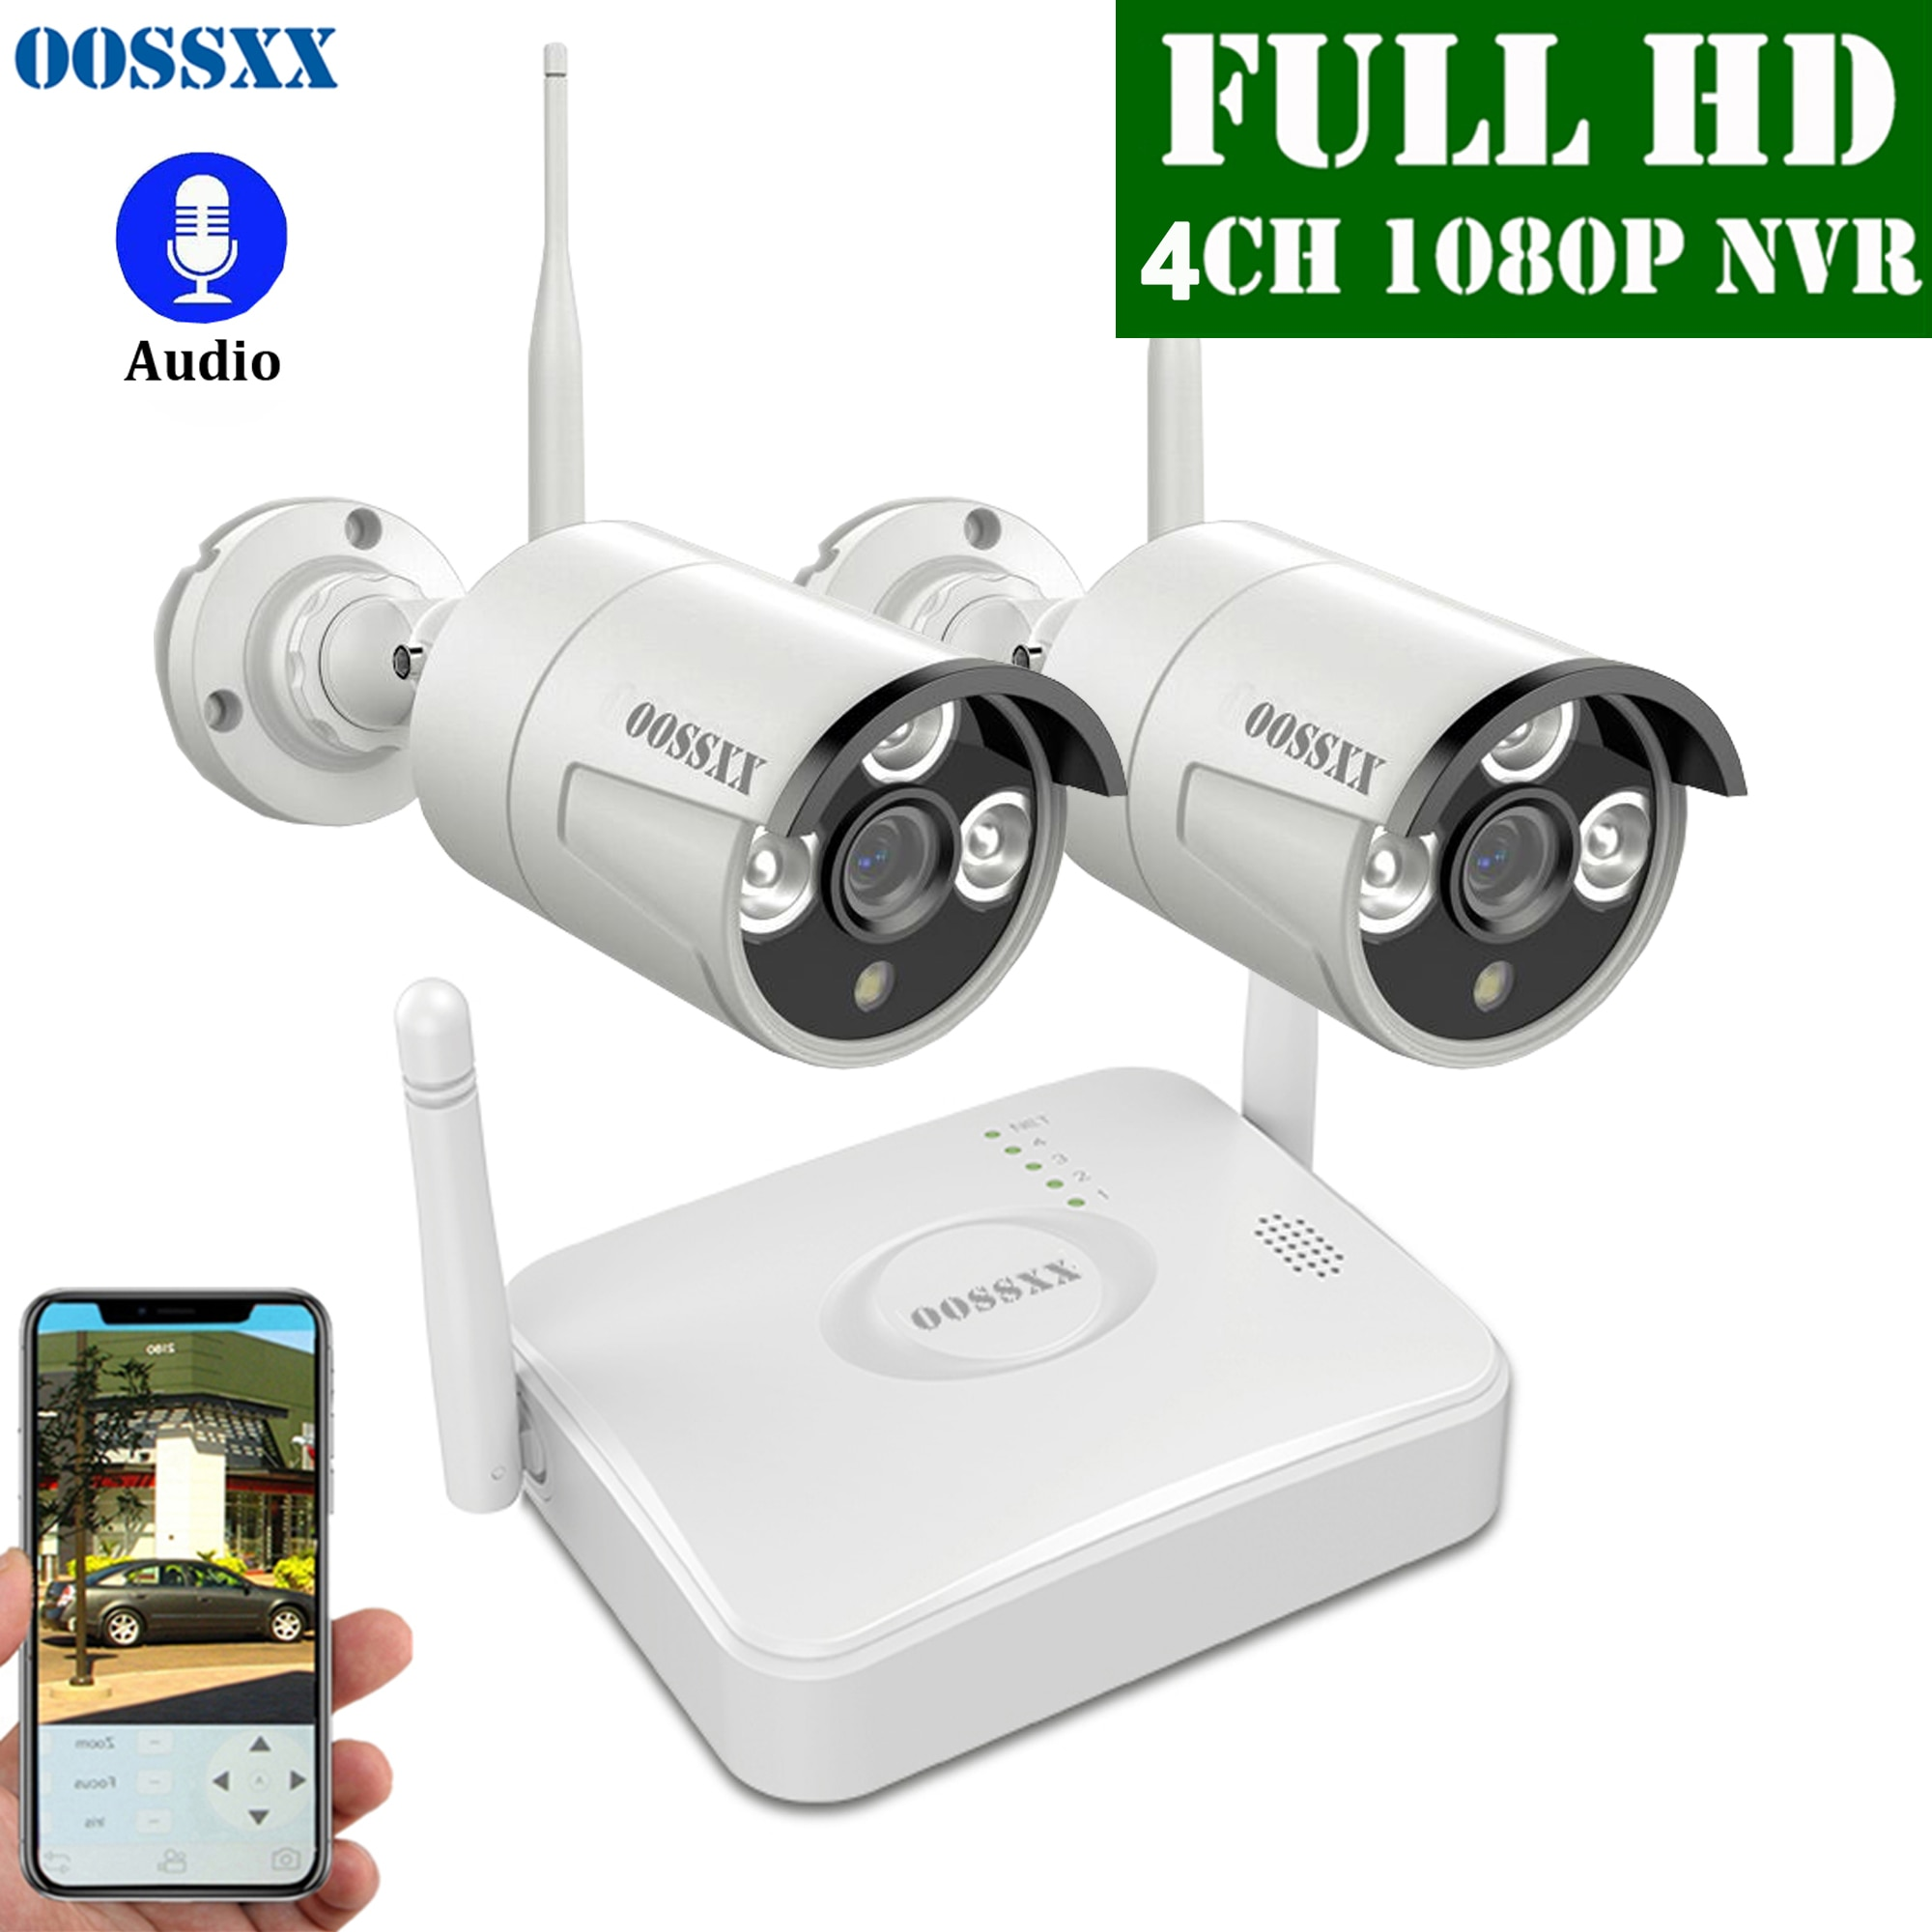 Sistema de cámara CCTV OOSSXX 4CH Kit NVR inalámbrico, 2 uds., 1080P, 2,0 MP, cámara de seguridad de Audio IP para exteriores, Wifi, sistema de videovigilancia